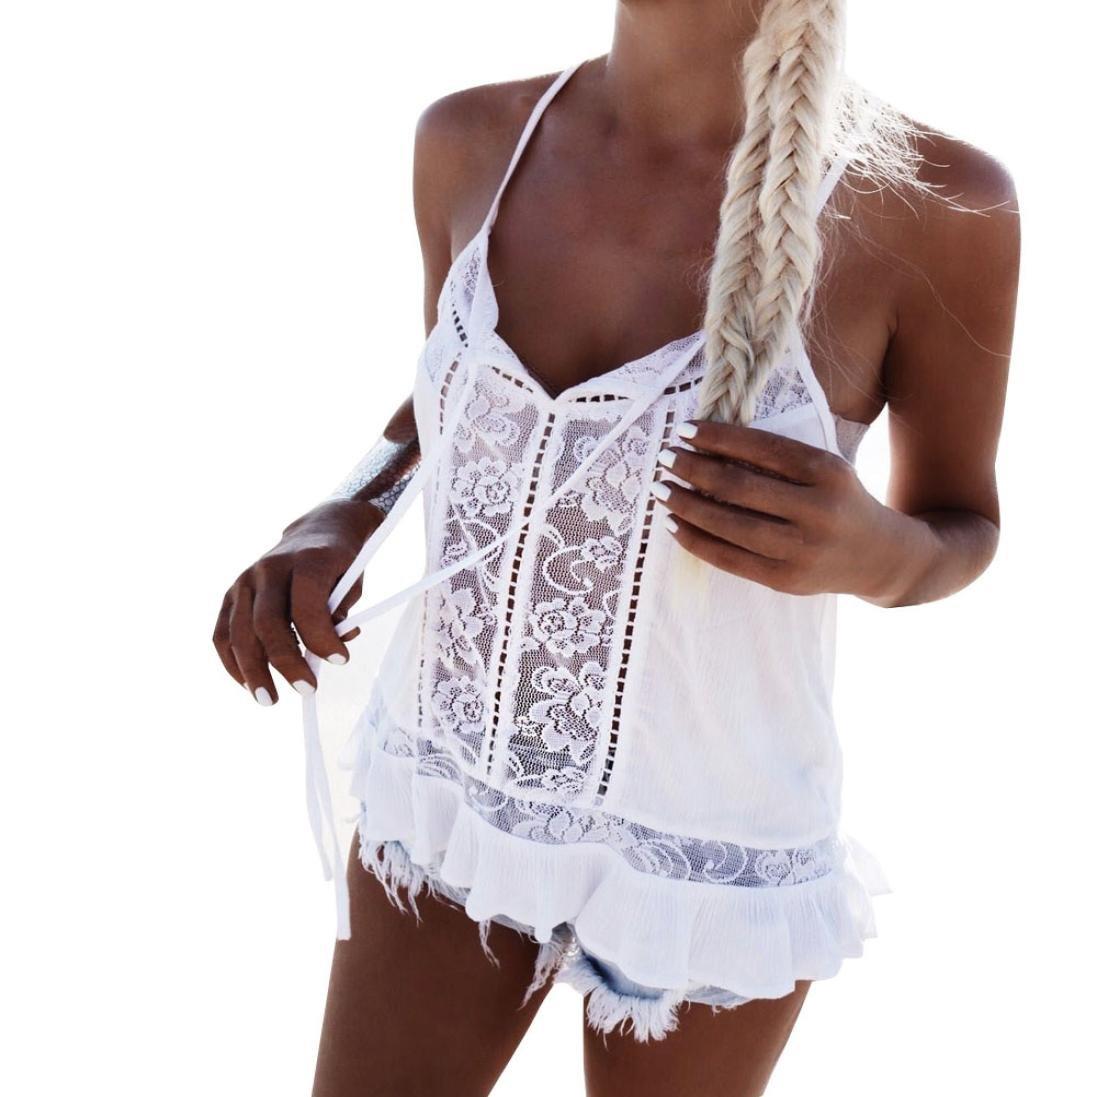 TOTOD Women Sleeveless Lace Chiffon Summer T-Shirt Blouse Vest Casual Tank Tops at Amazon Womens Clothing store: